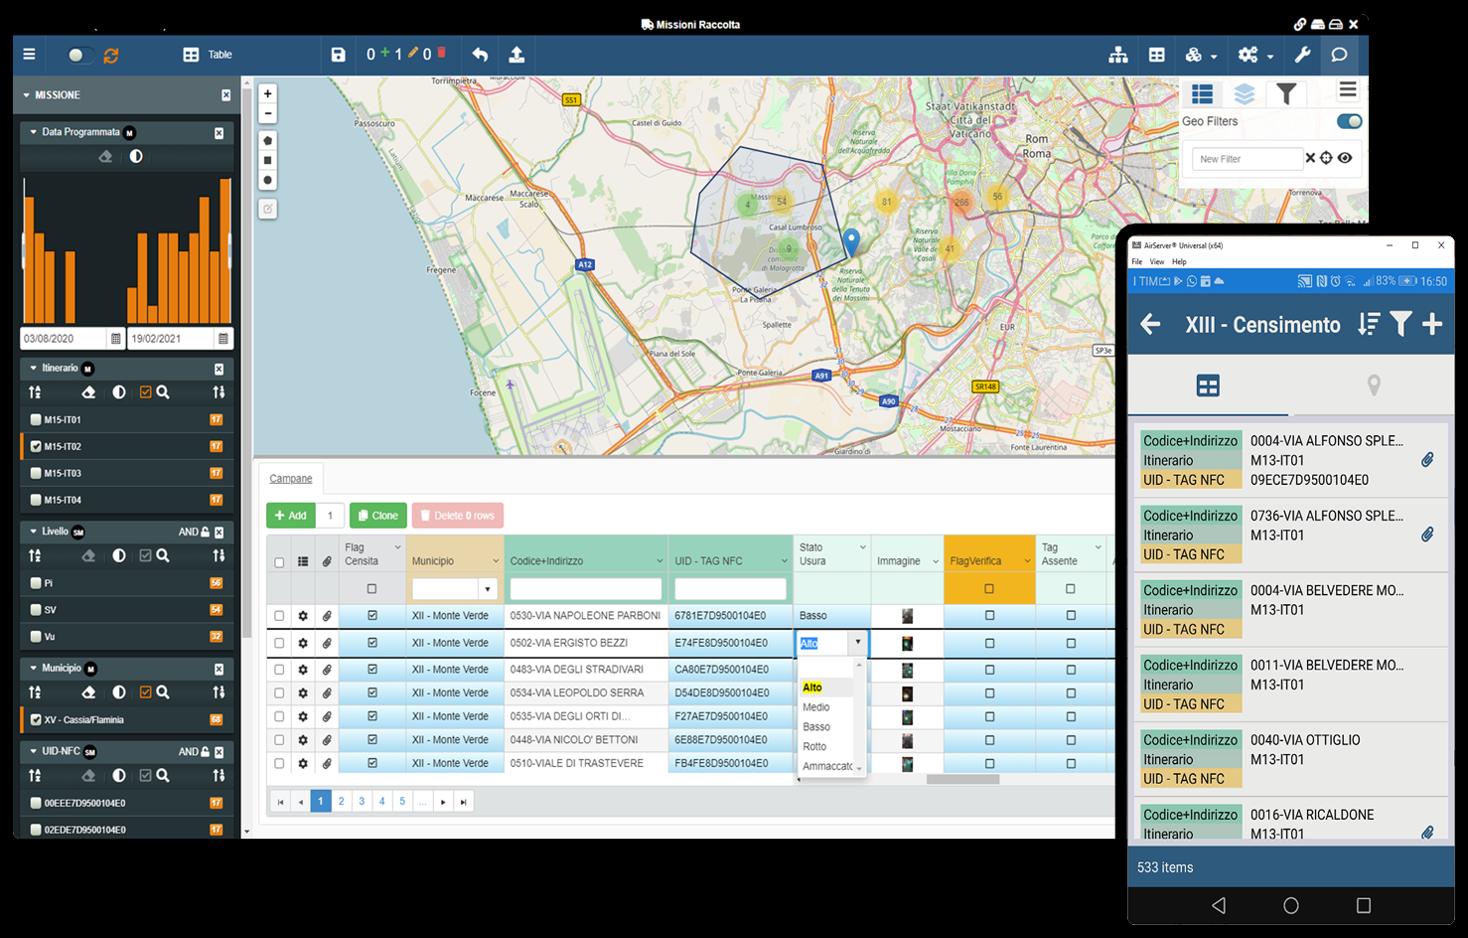 eLegere Enabling Smart Operational Process (SOP) transformation